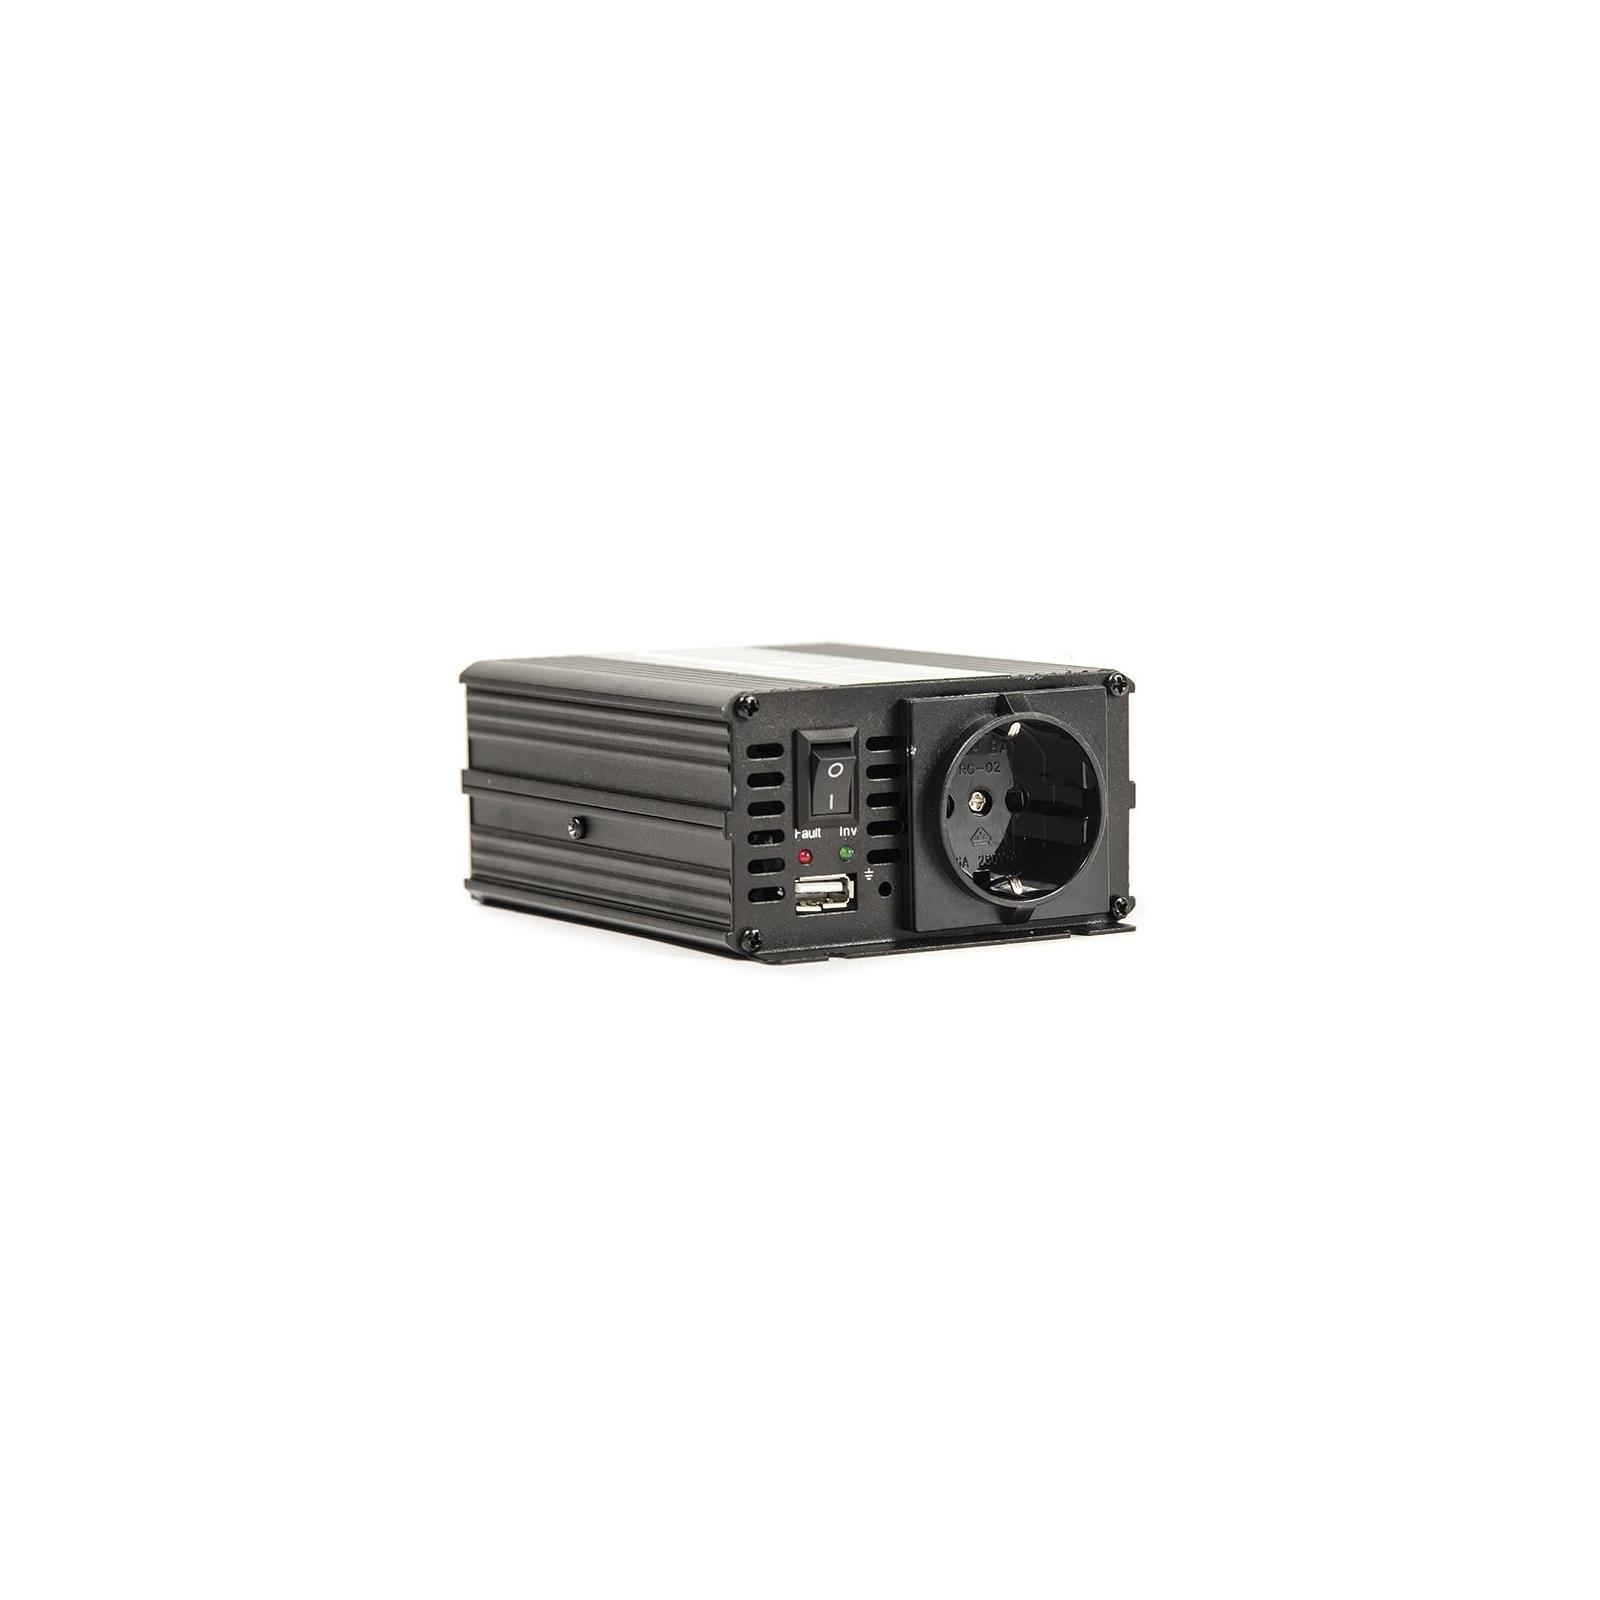 Автомобильный инвертор 24V/220V 300W, USB 5V 1A, HYM300-242 PowerPlant (KD00MS0002) изображение 4